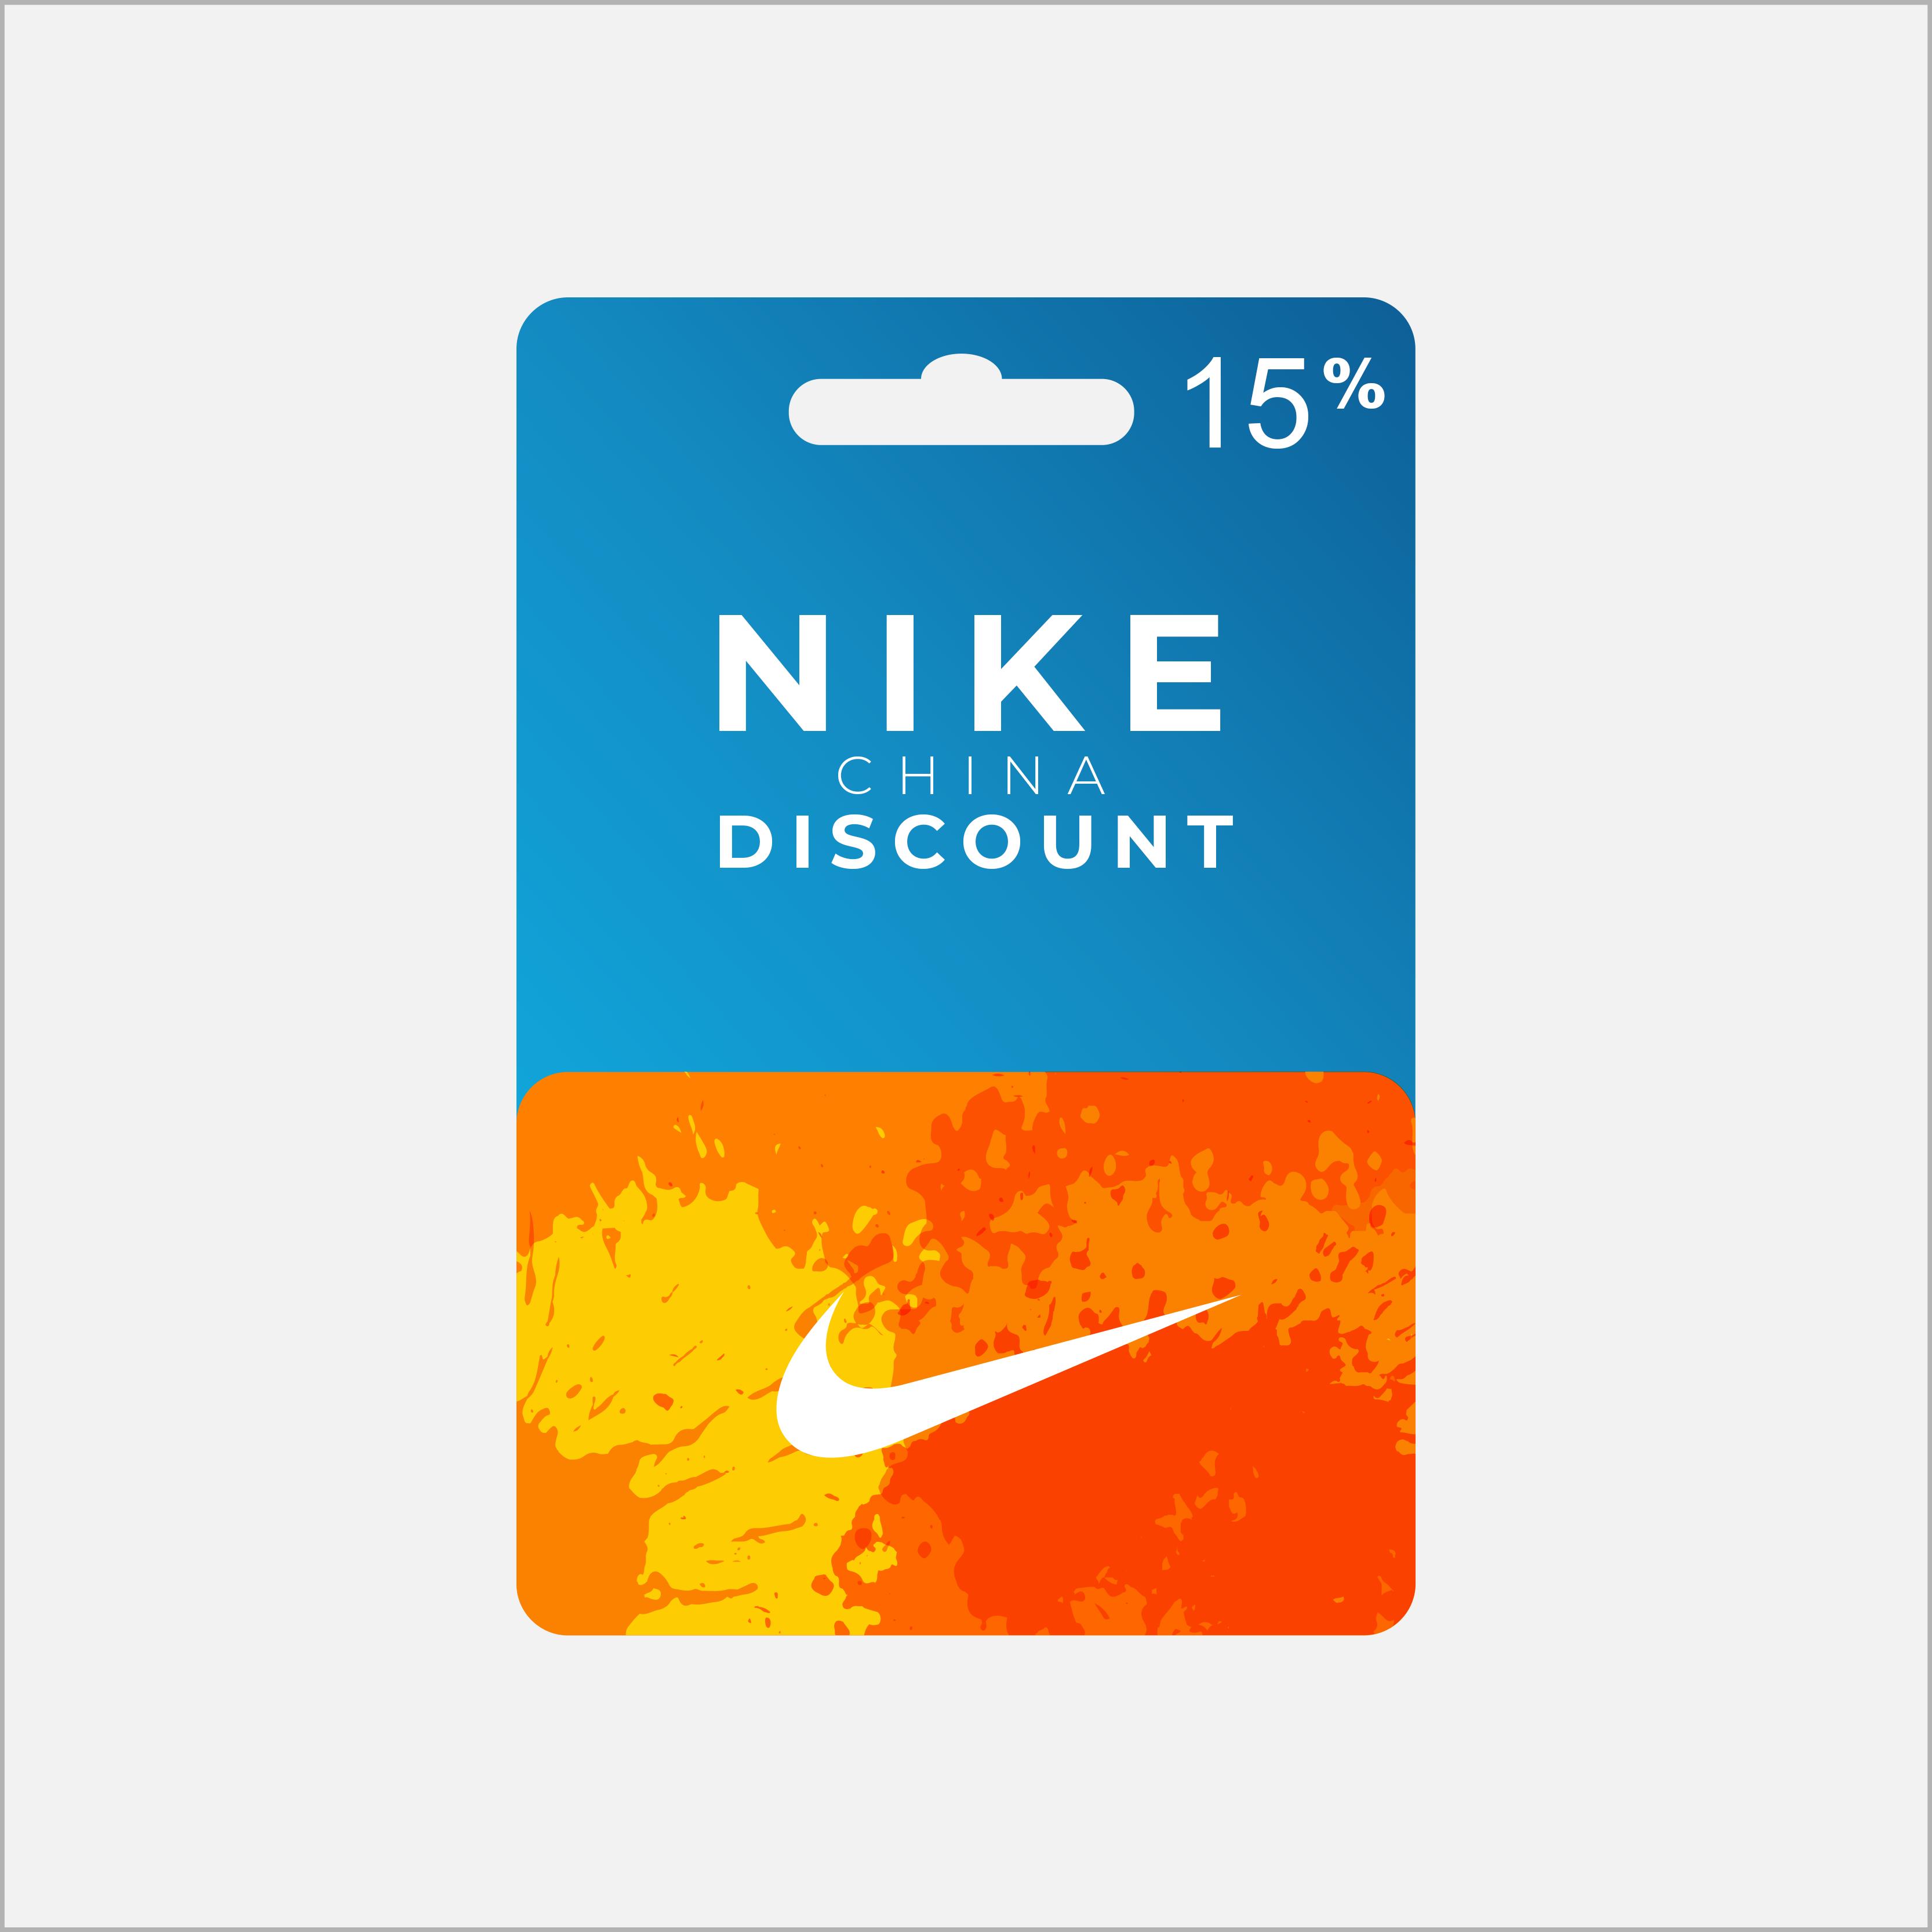 nike discount code off 68% trinovo.se